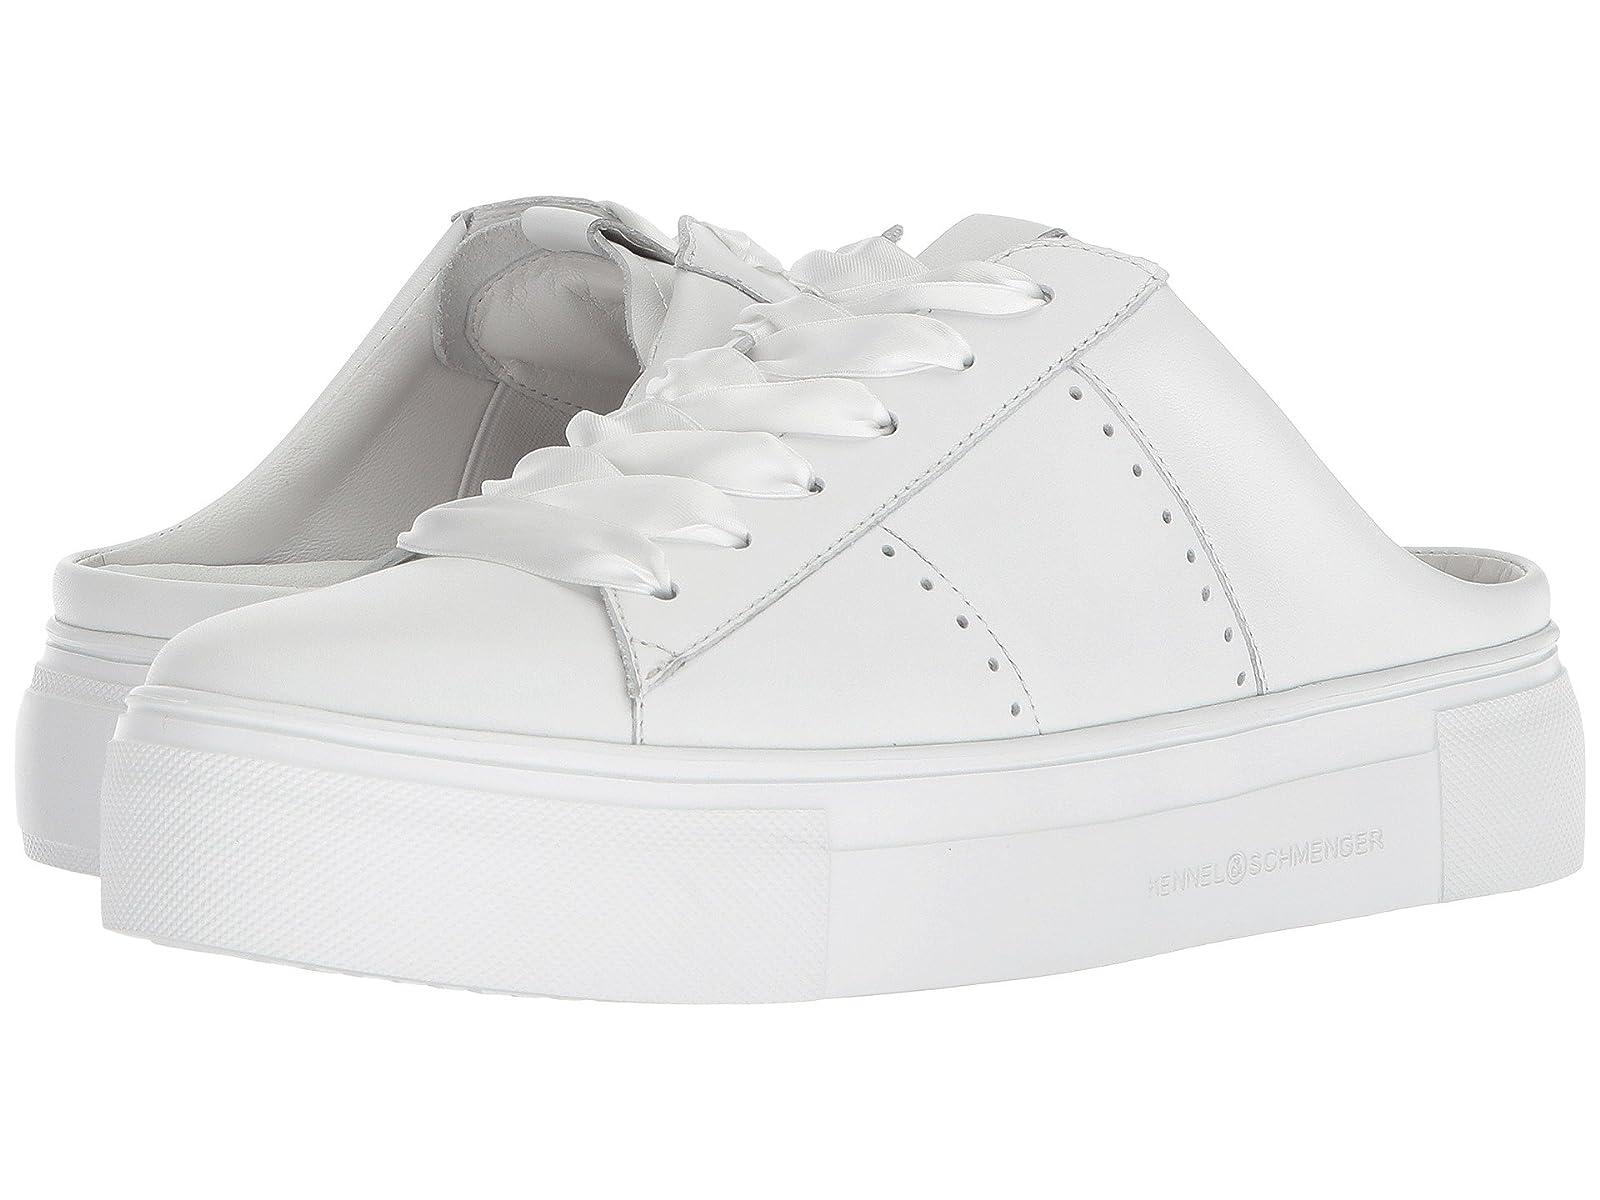 Kennel & Schmenger Big Sneaker MuleAtmospheric grades have affordable shoes